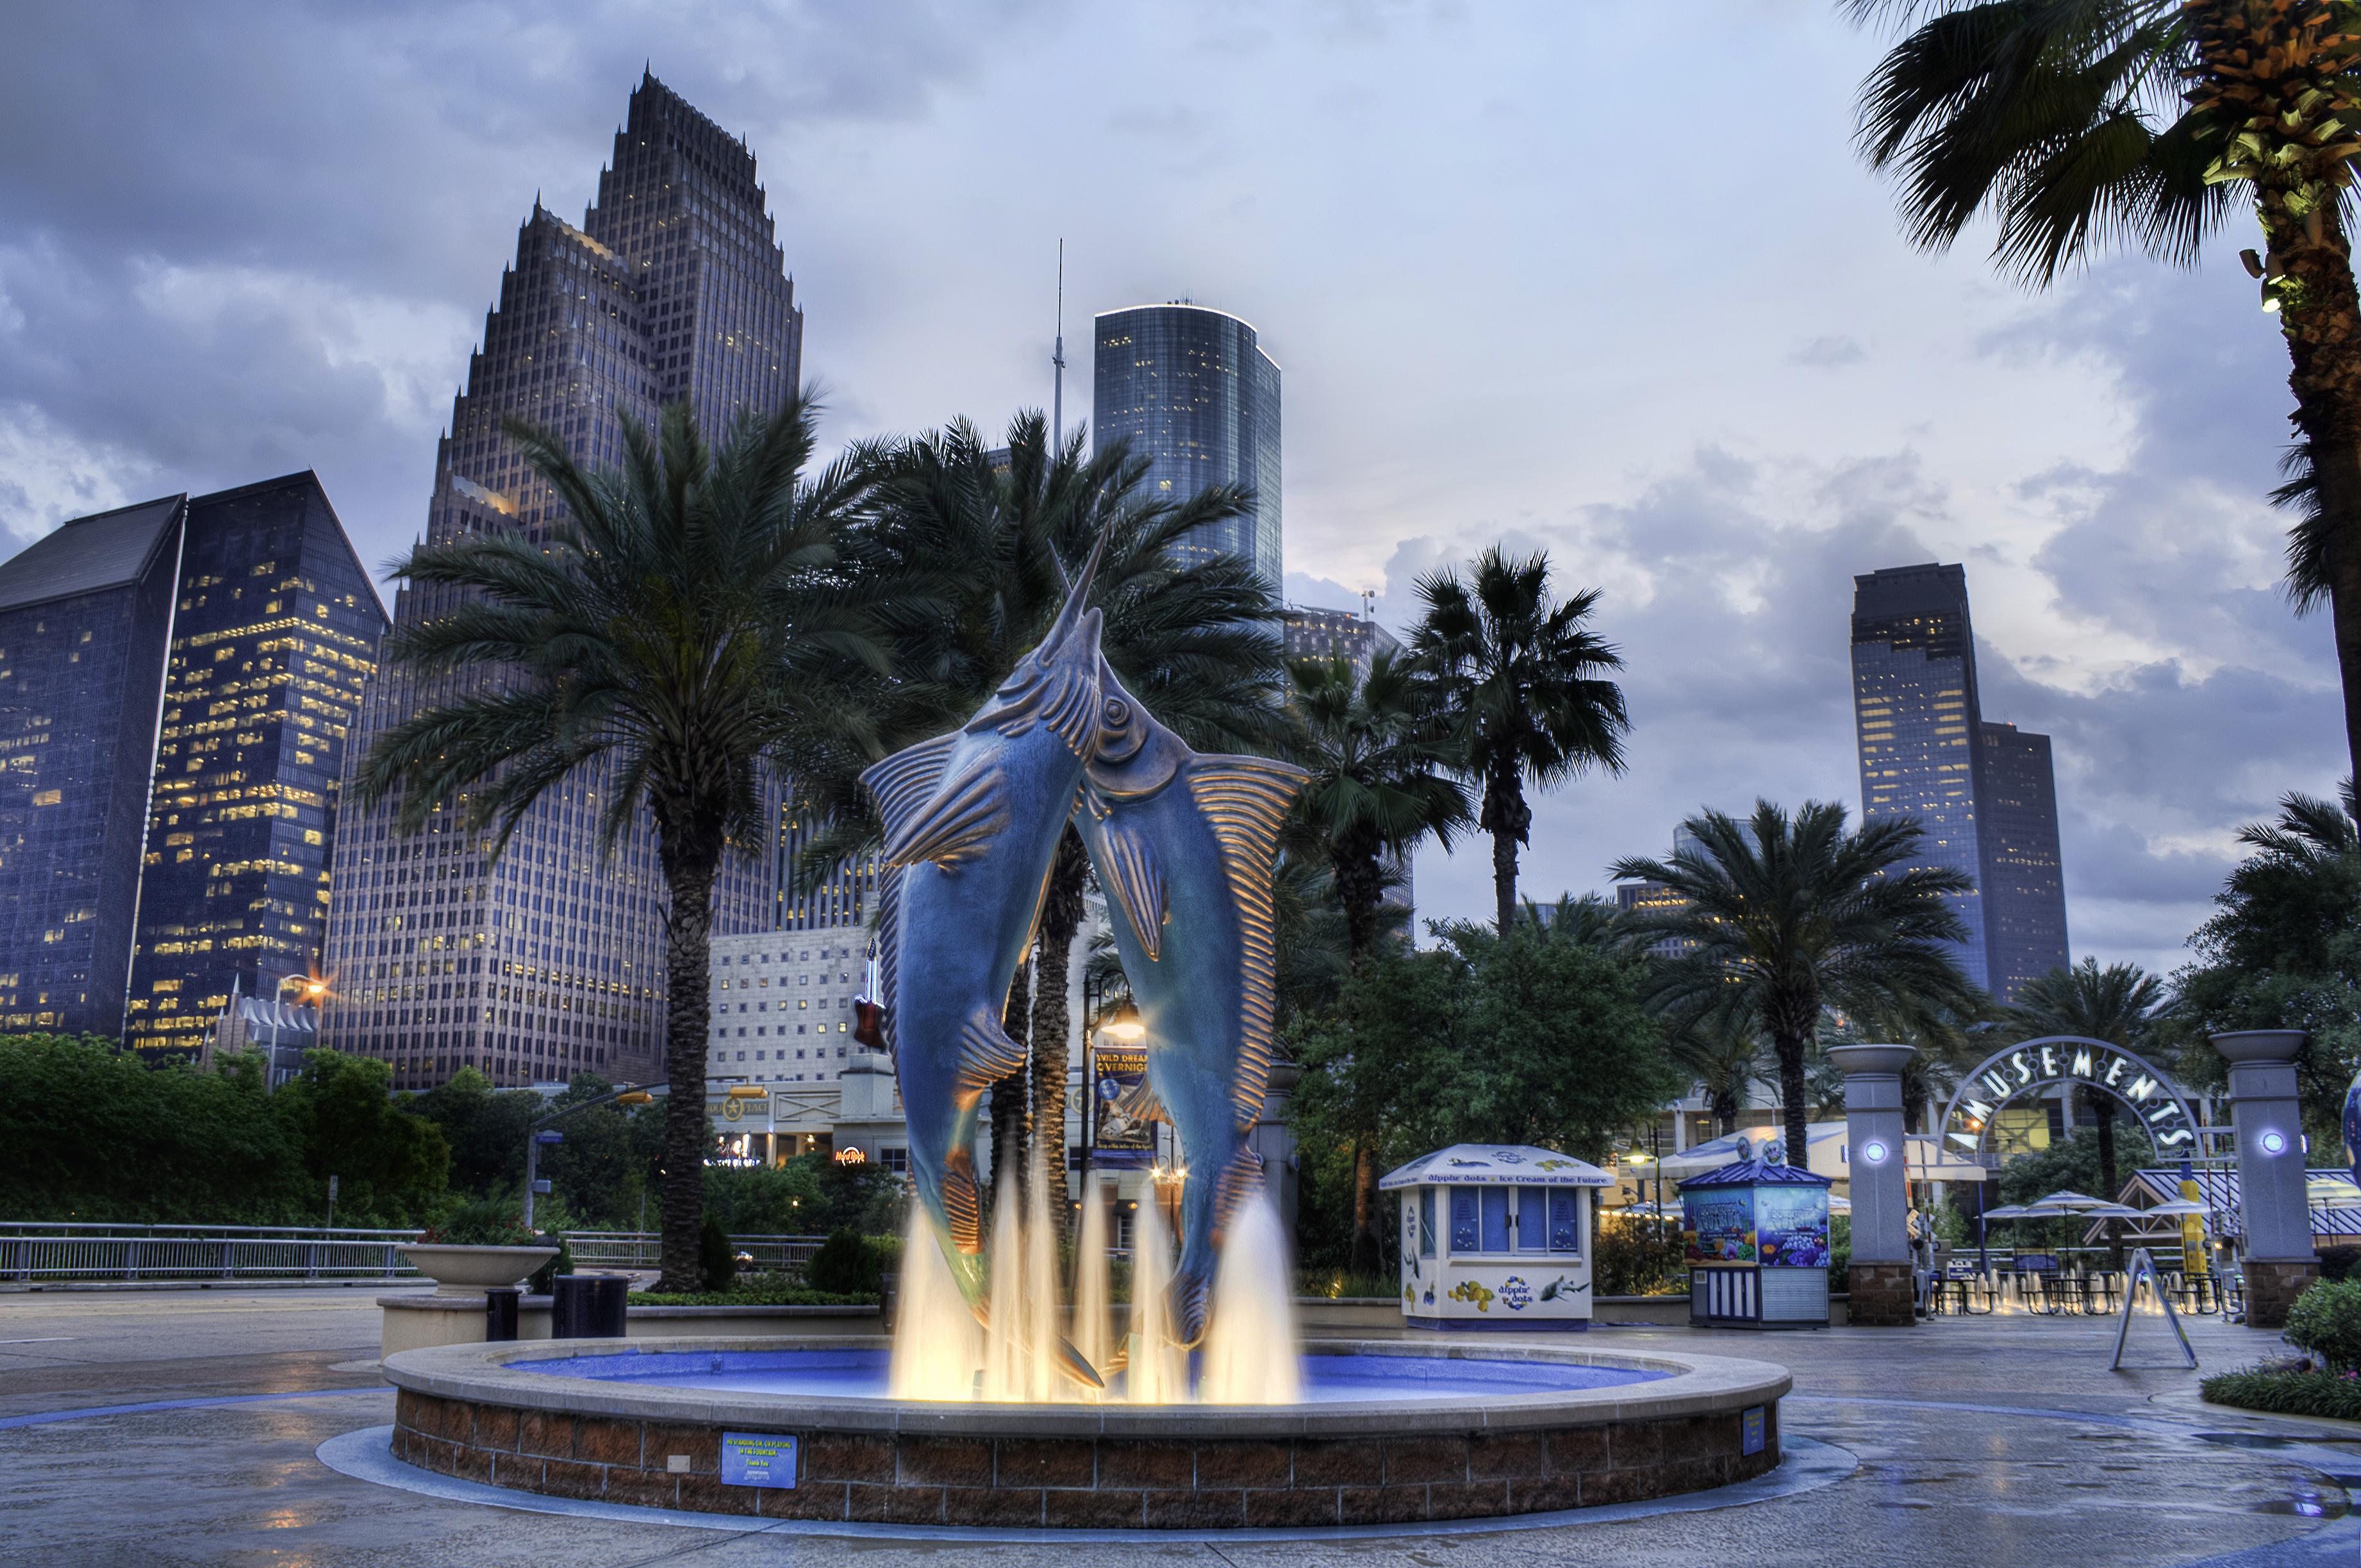 Downtown Houston Aquarium in 2012.jpg